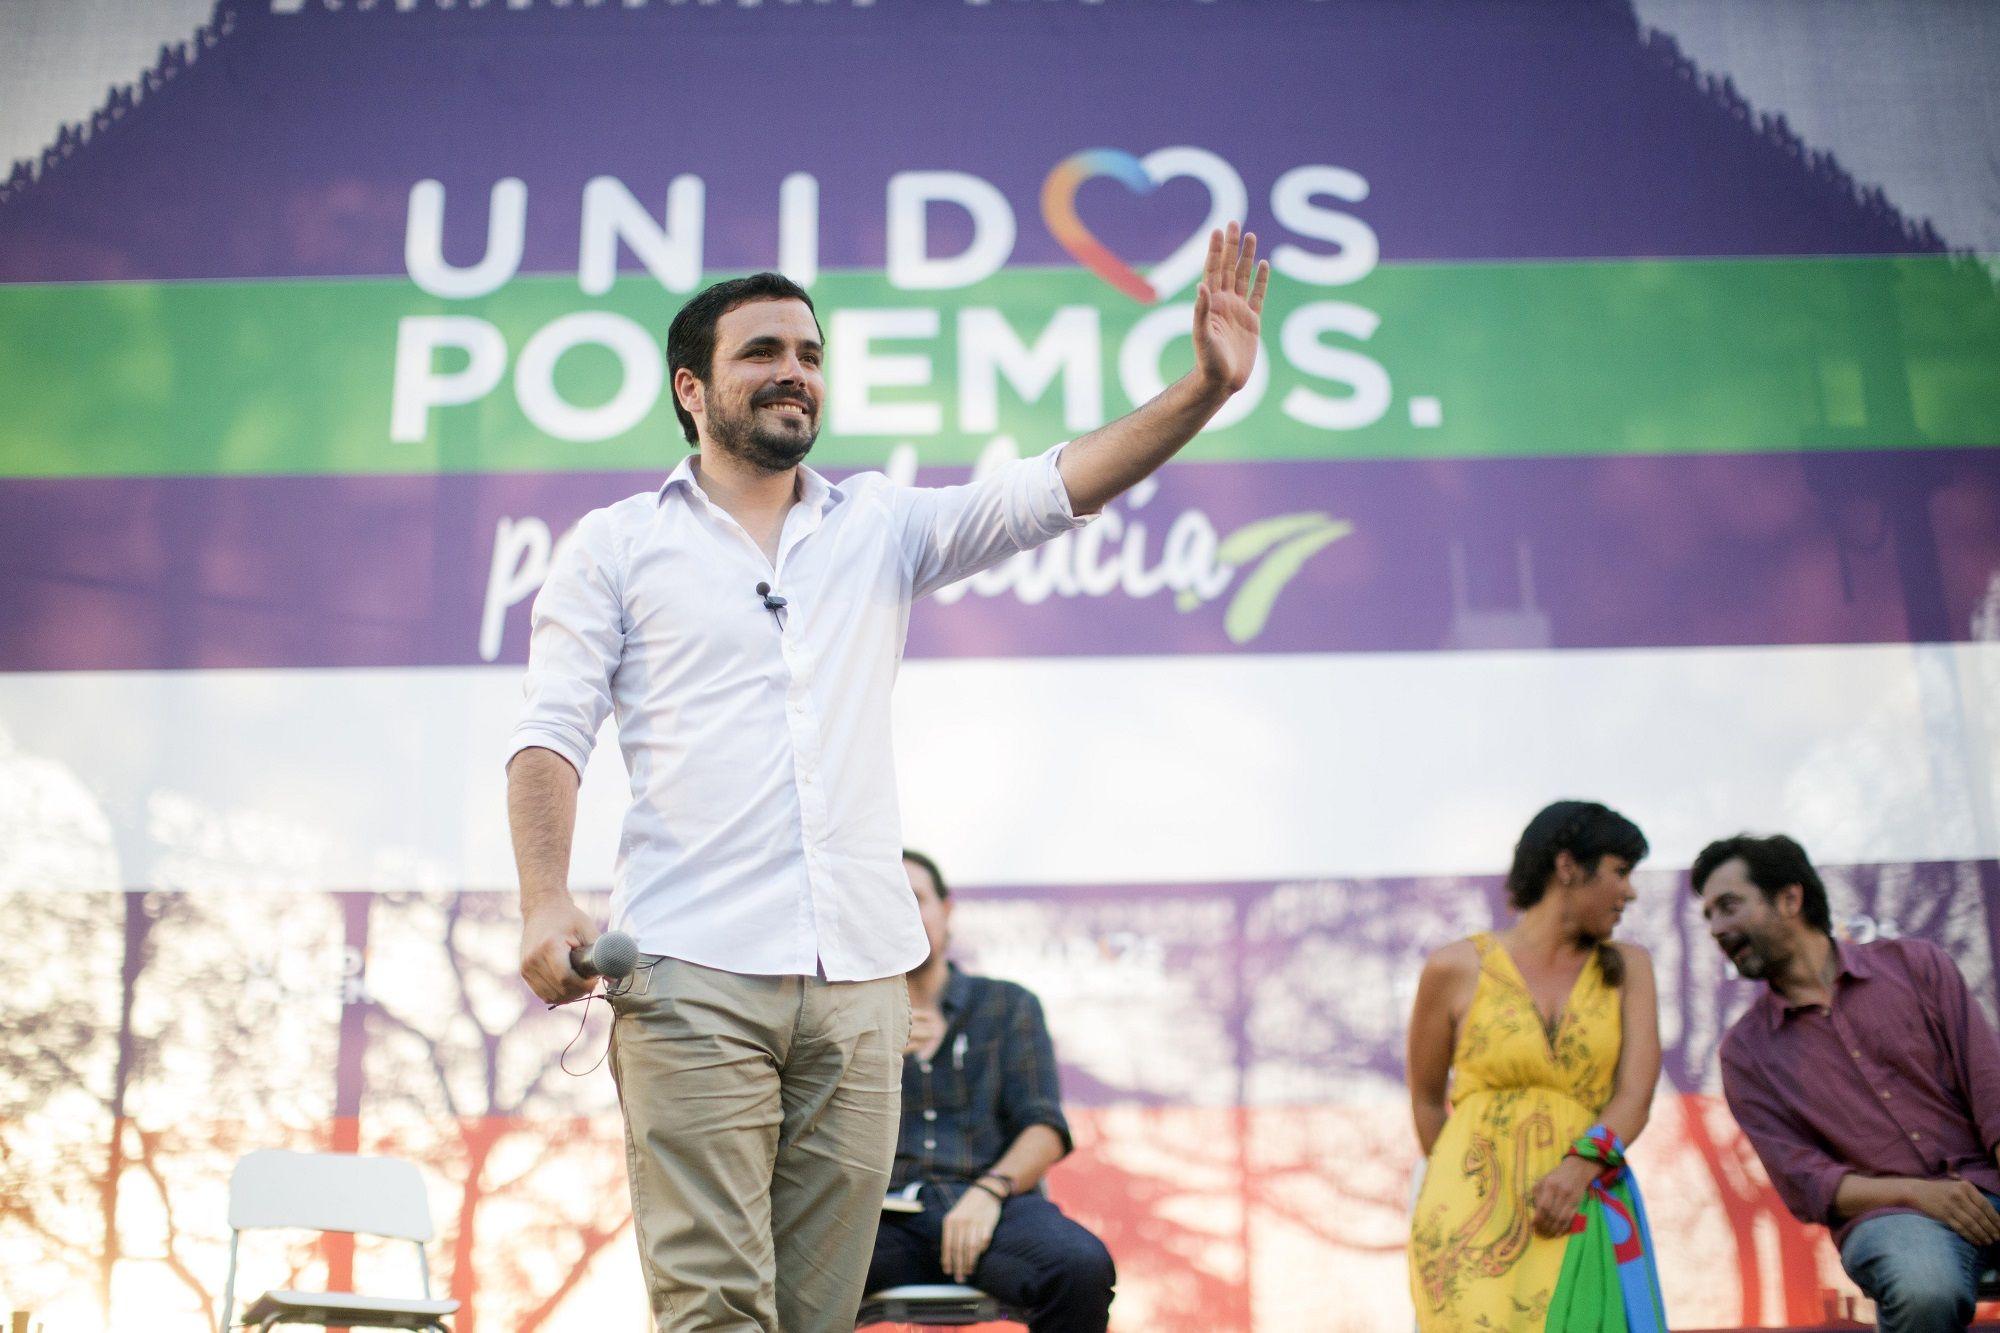 Intervención de Alberto Garzón, secretario general de Izquierda Unida, en elmitin de Unidos Podemos | 23 jun 2016 | Juan Carlos Corchado para MIRA Jerez